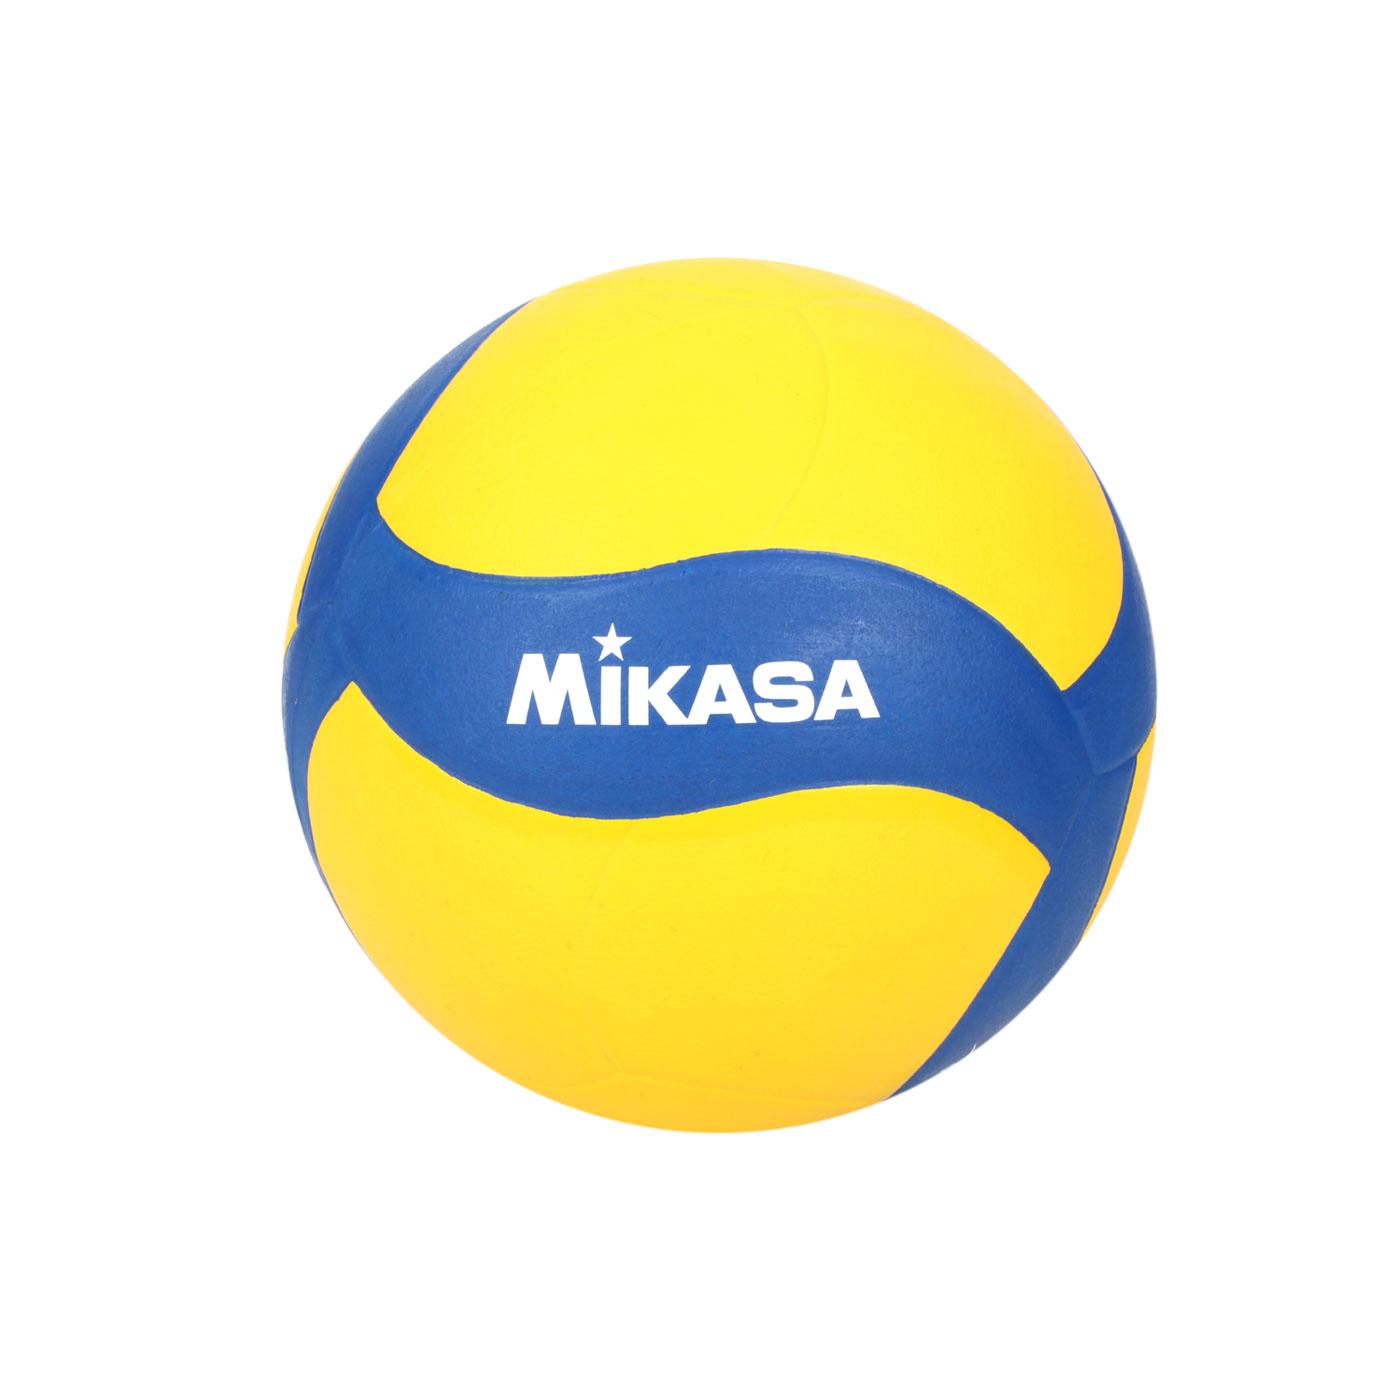 MIKASA 螺旋型軟橡膠排球#3 V023WS